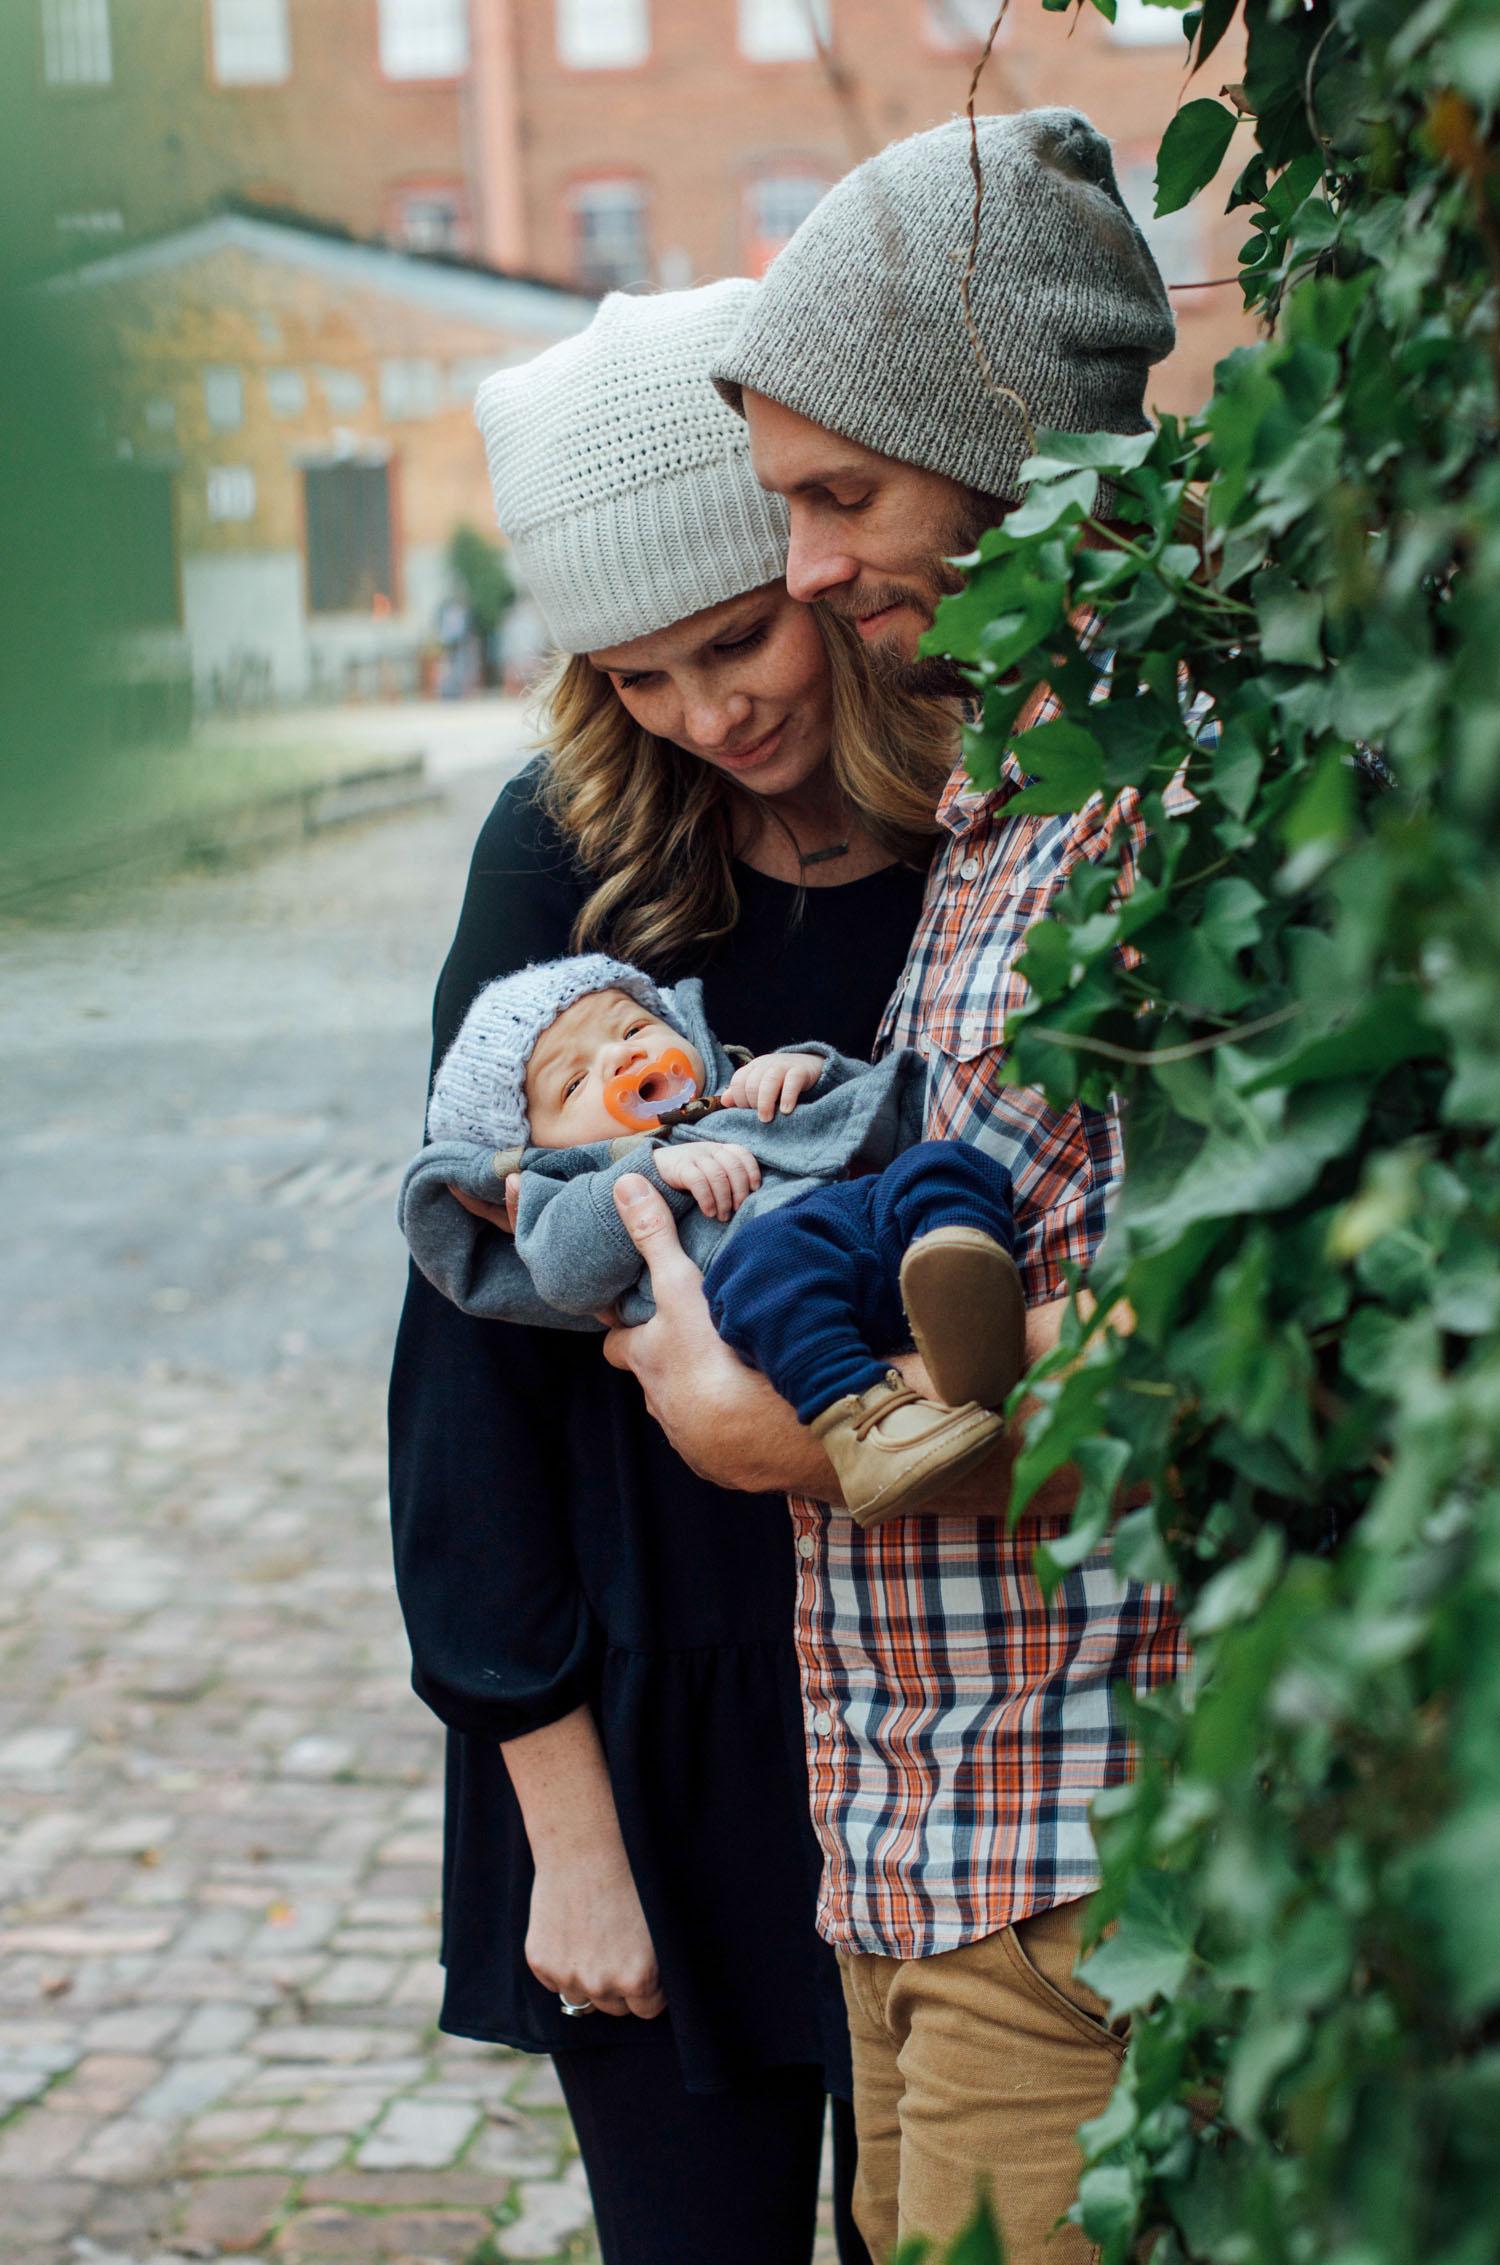 Again We Say Rejoice - Newborn Photo Session at The Goat Farm Atlanta GA (7 of 23).jpg